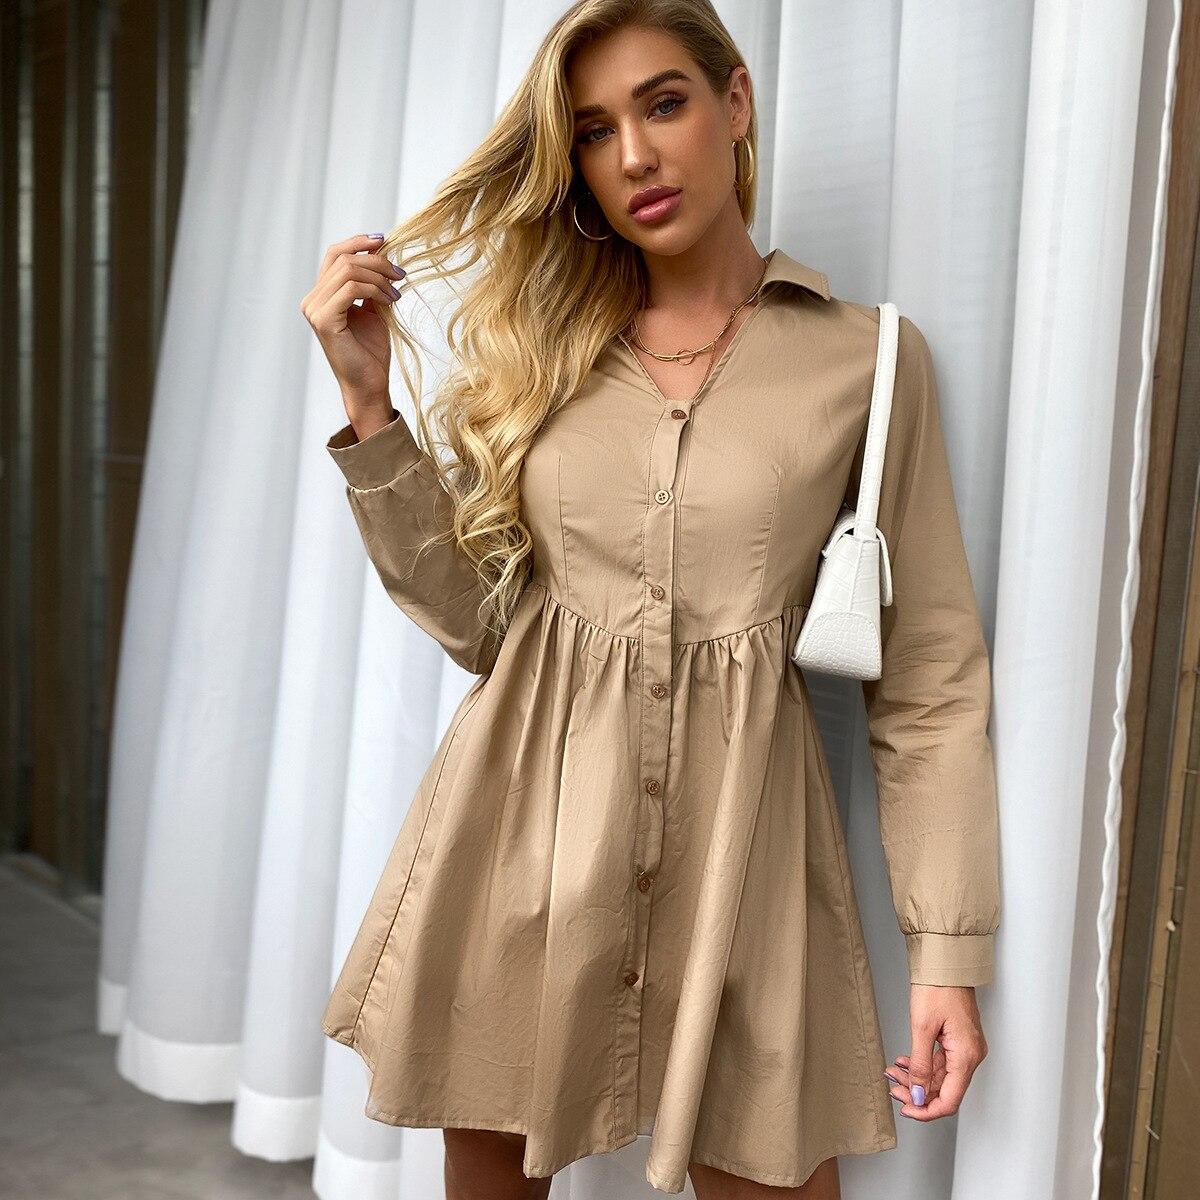 2020 New Autumn Solid  Women Mini Dress Shirring V-neck Bodycon Elegant High Waist Full Sleeve Pleated Dress